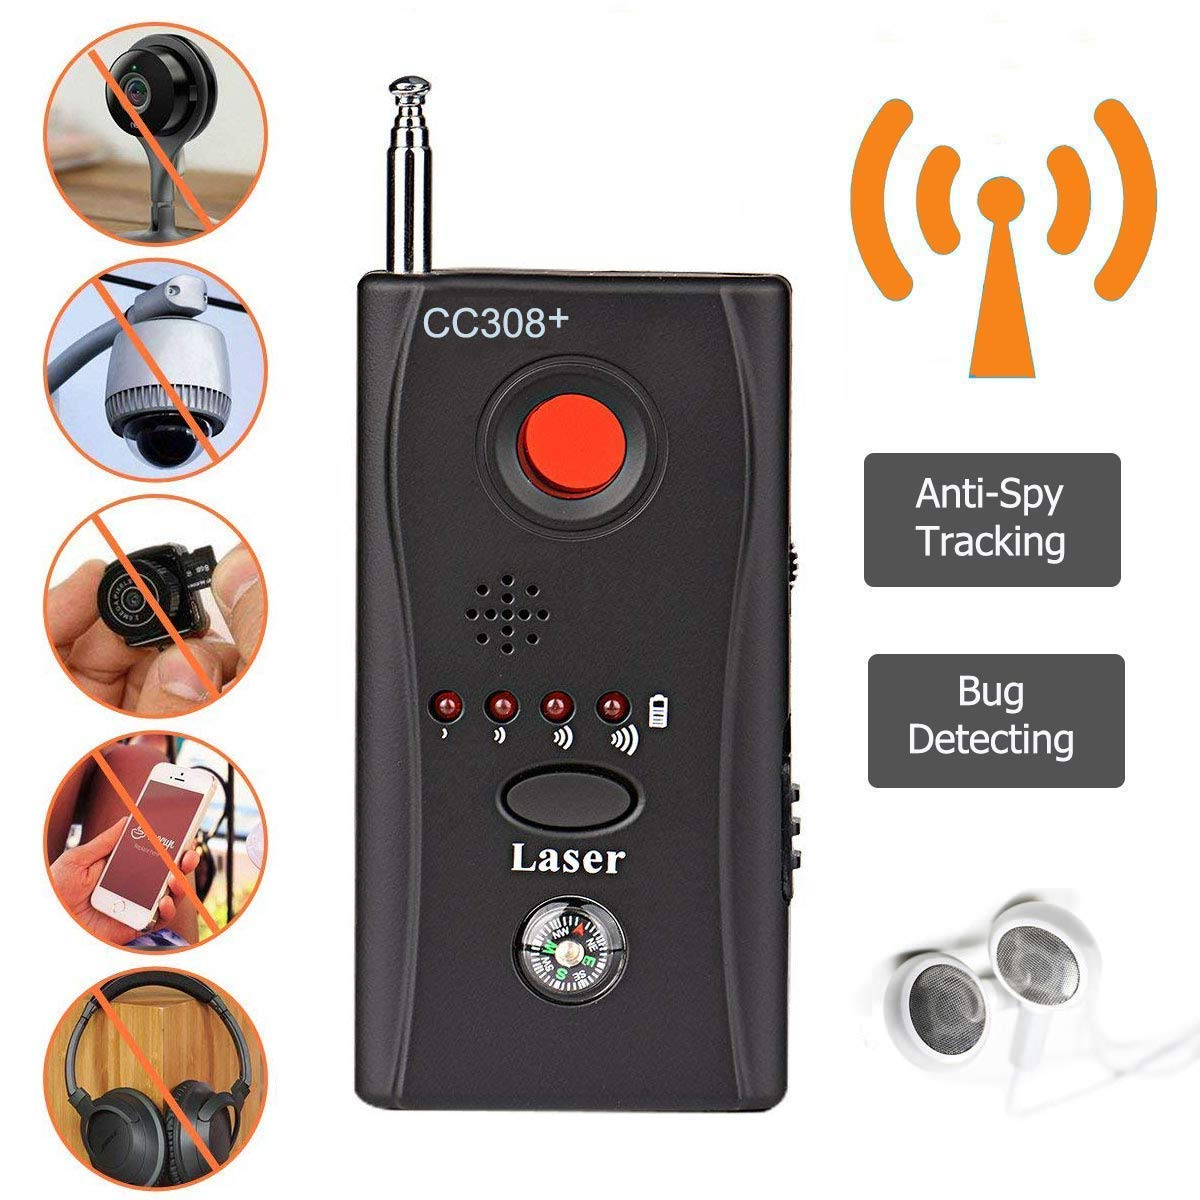 cc308-2 Hangang Rf-Detektor-Wanzen-Detektor Anti-Spionage-Signal-Detektor Allm/ächtige versteckte Kamera-Laser-Linse Gsm-Ger/ät-Finder